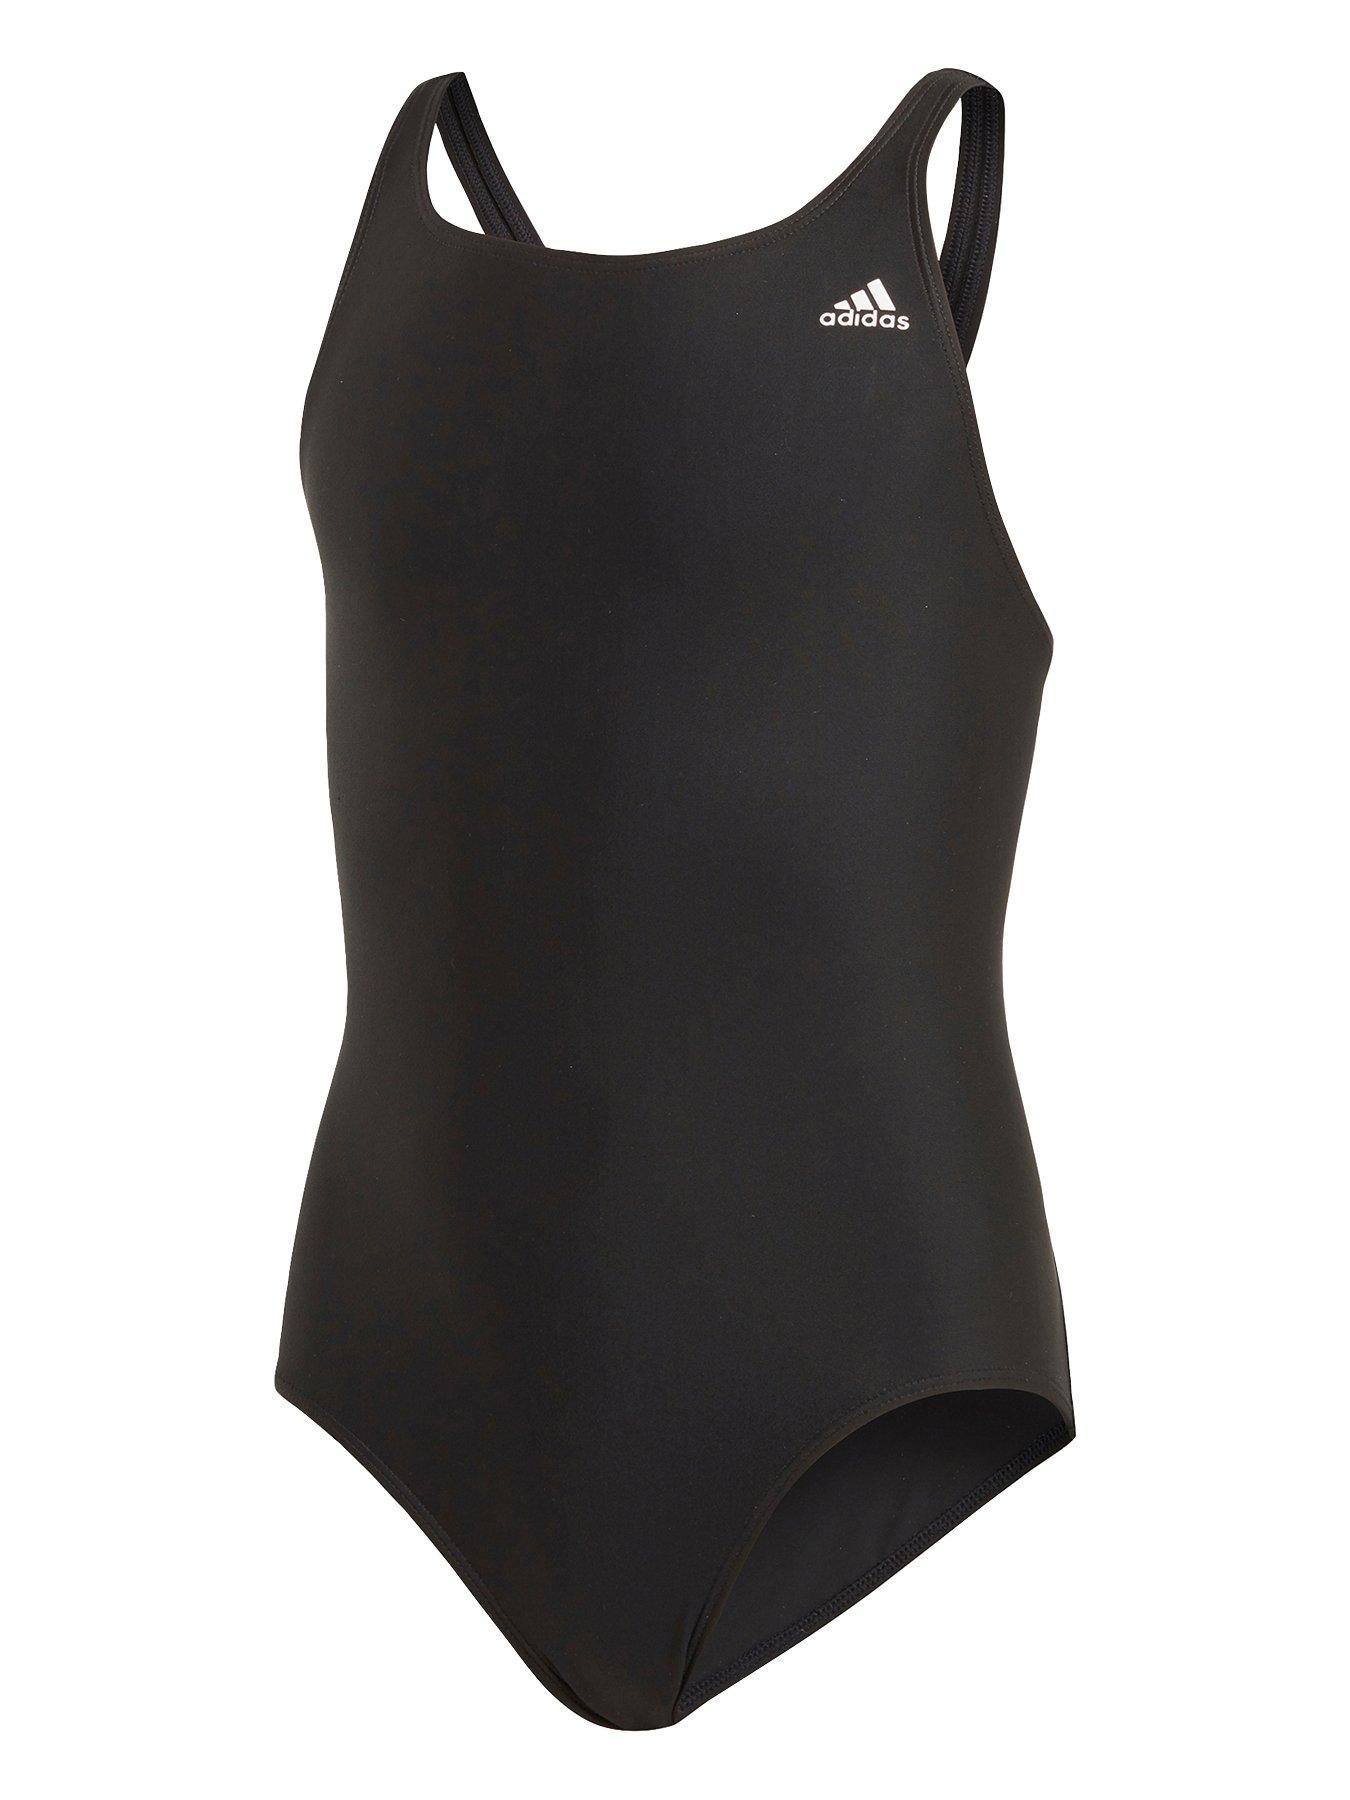 adidas swimming costume age 11